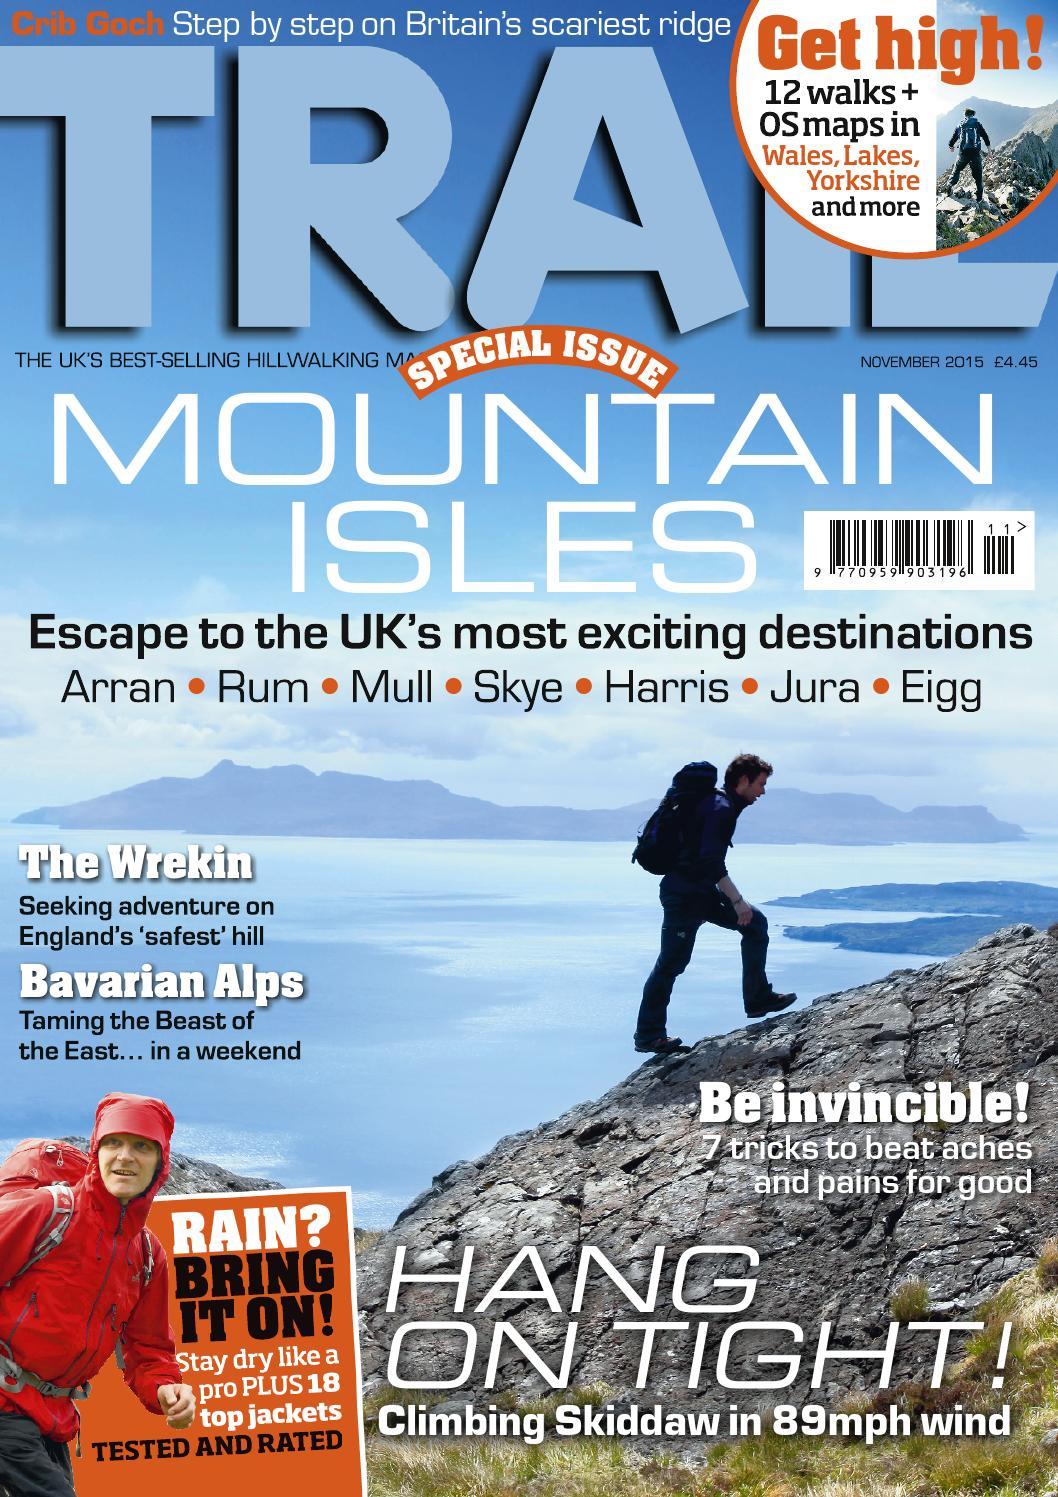 Trail magazine - November 2017 (BRAND NEW/SEALED)